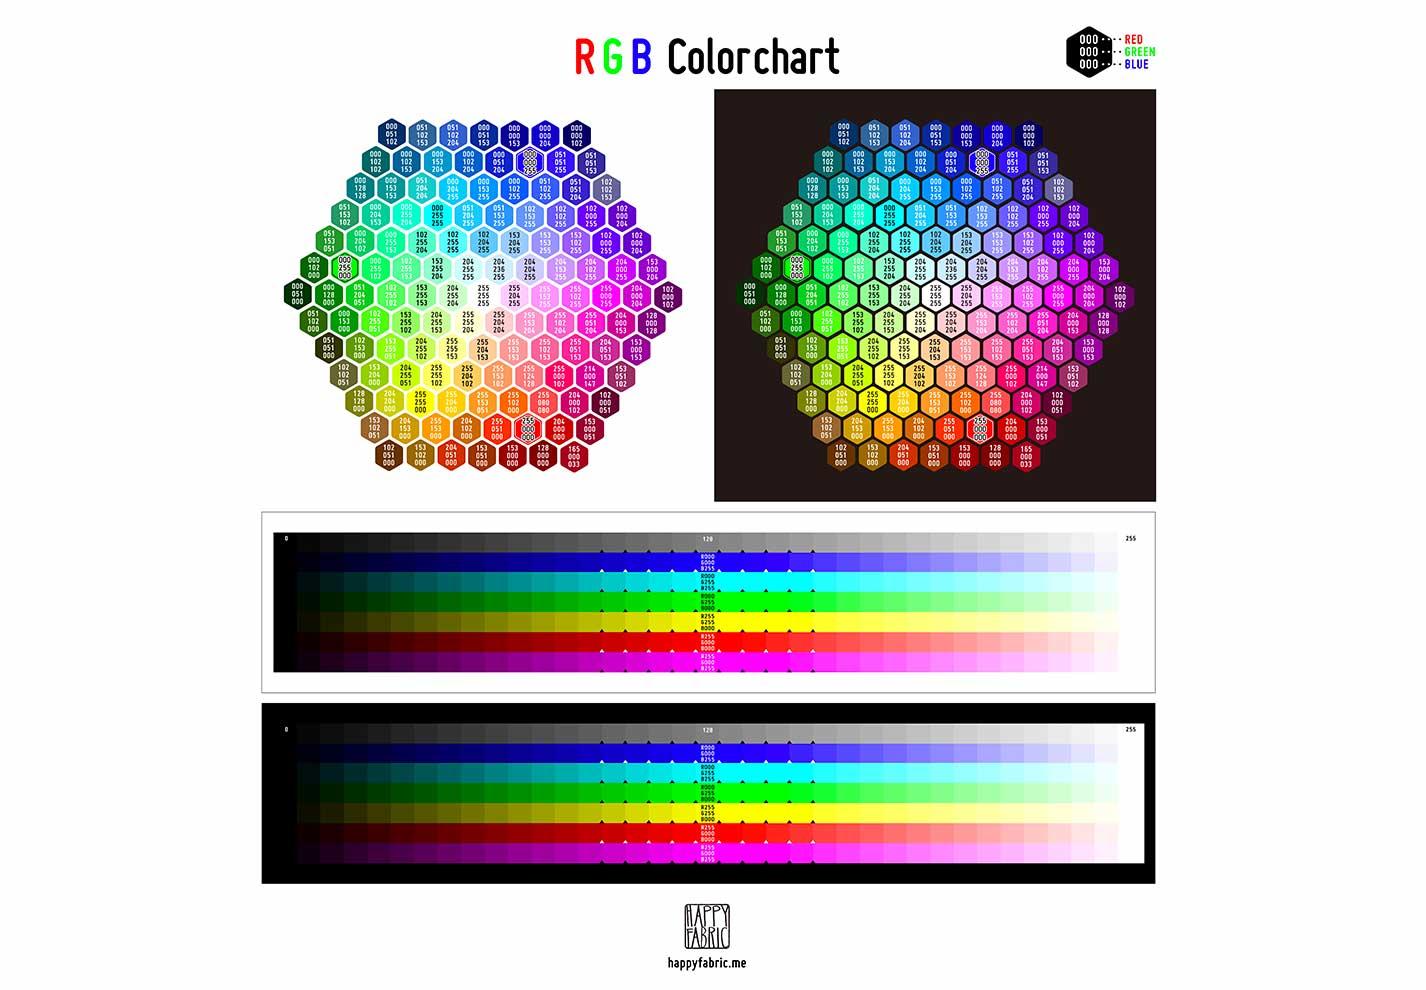 RGBカラー見本元画像